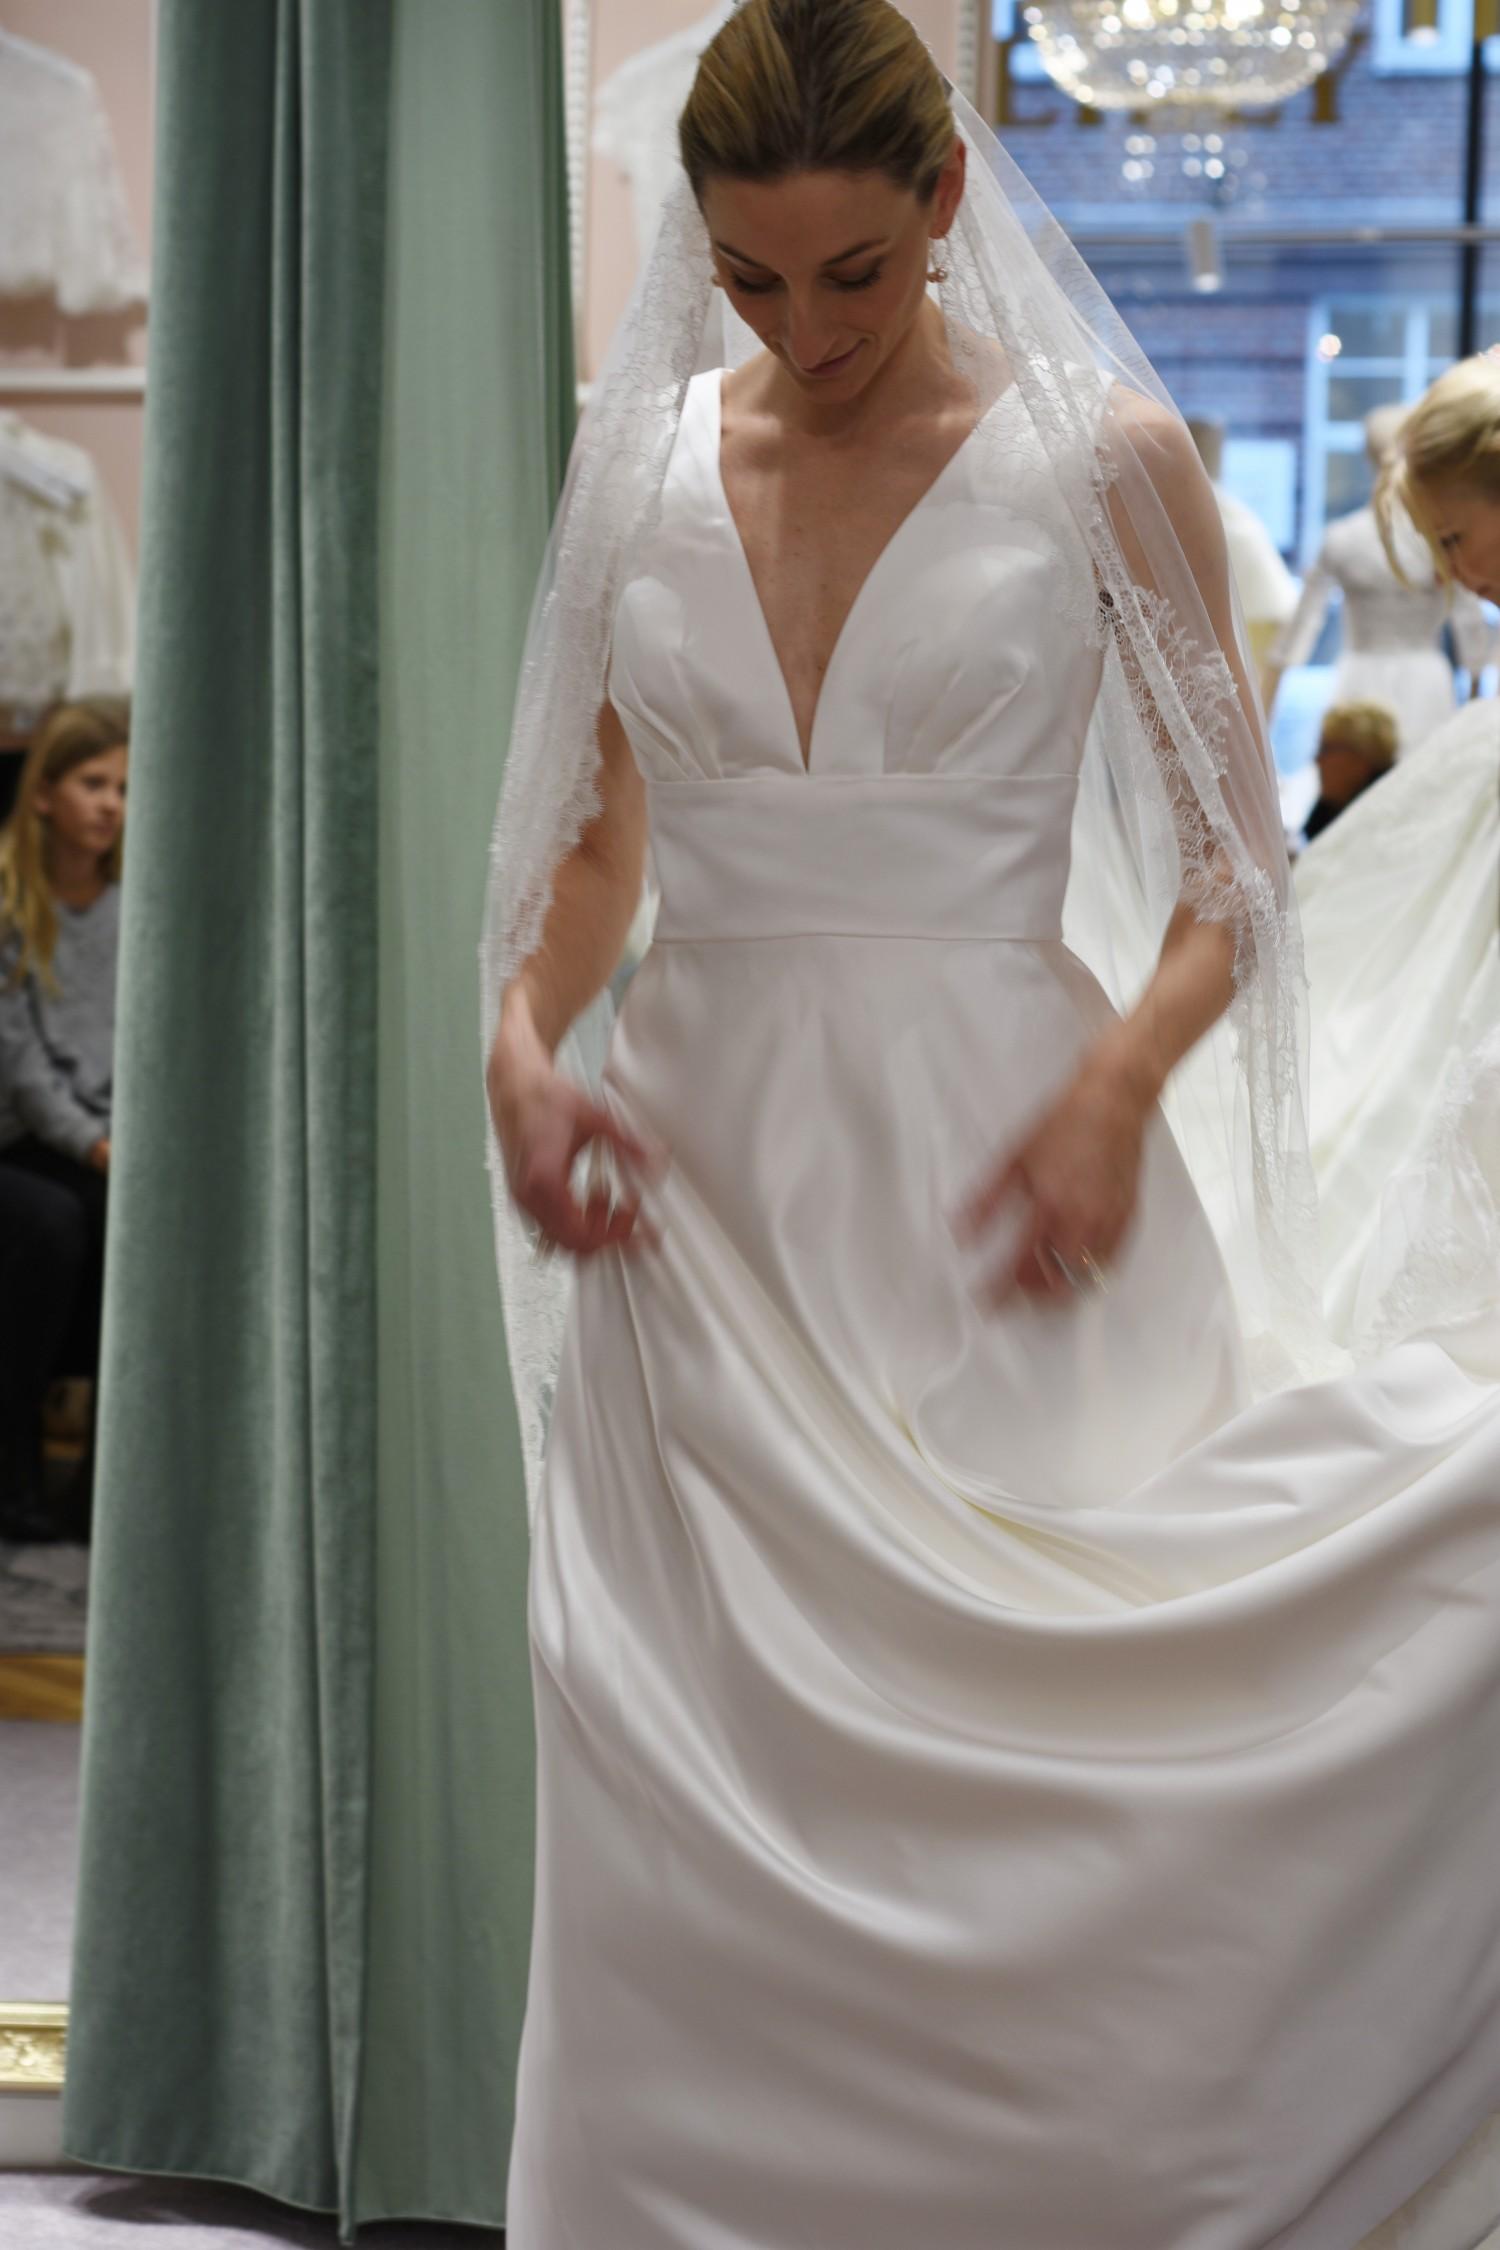 lilly-brudekjoler-annemette-voss-19